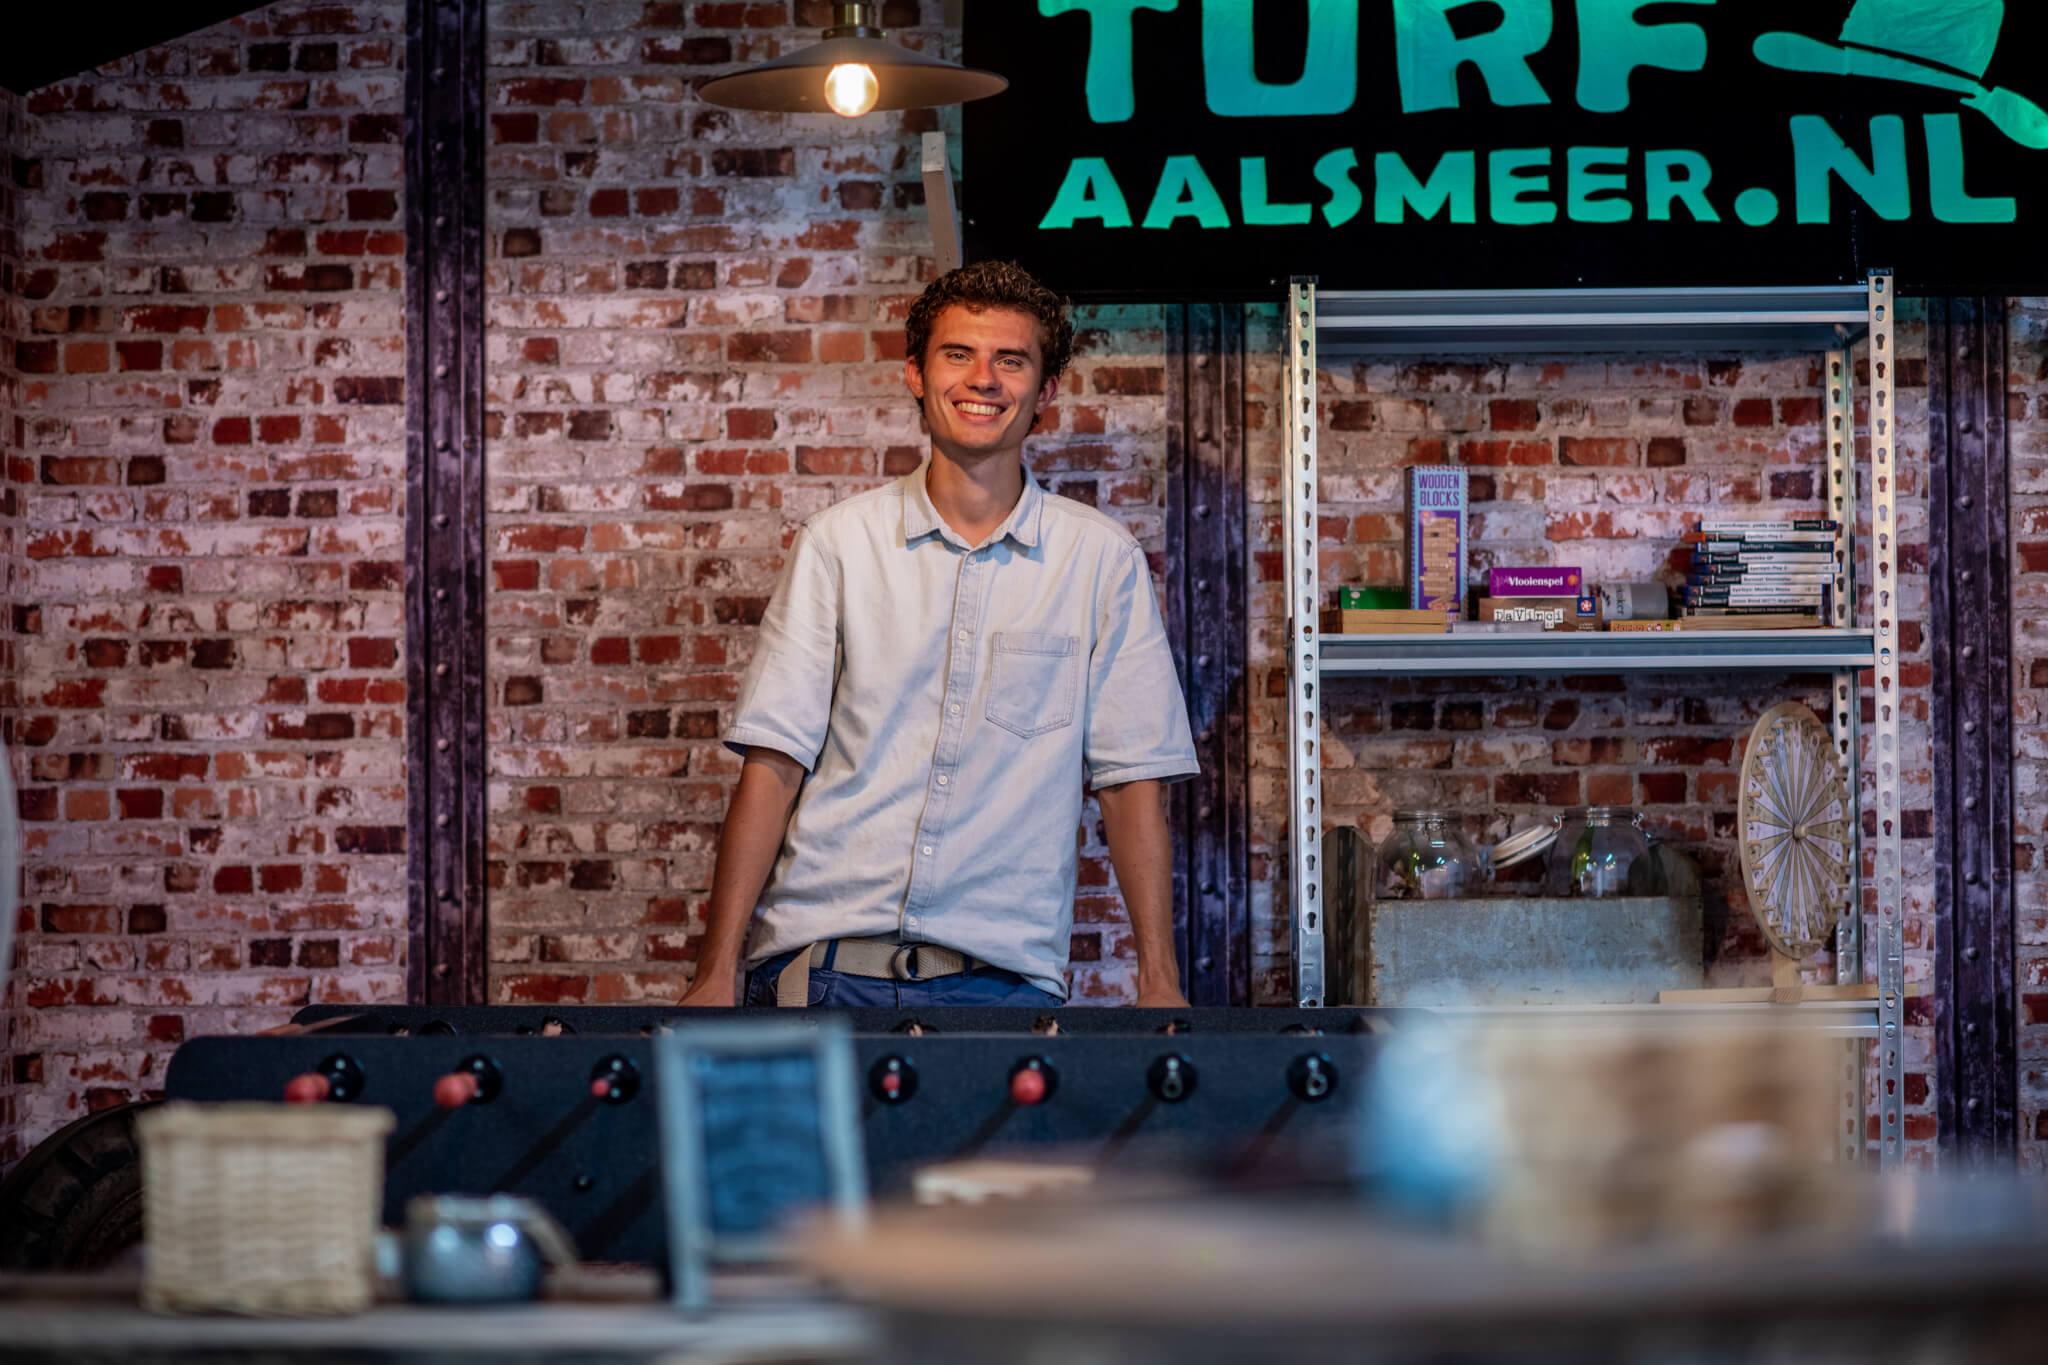 Real Life Gaming - Turf Aalsmeer